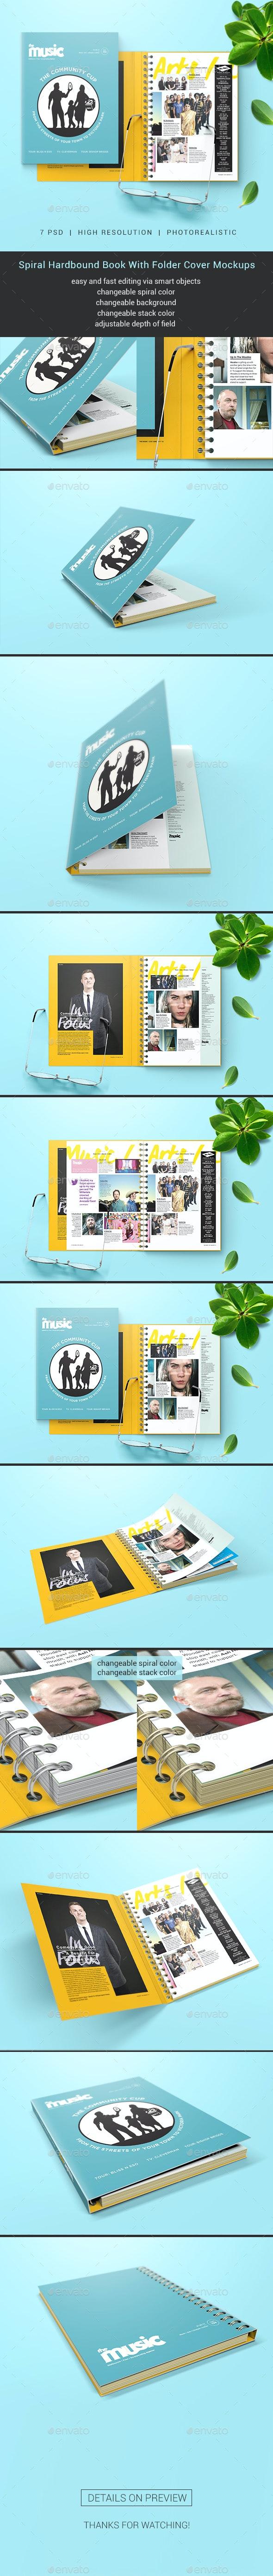 Spiral Hardbound Book With Folder Cover Mockups - Books Print